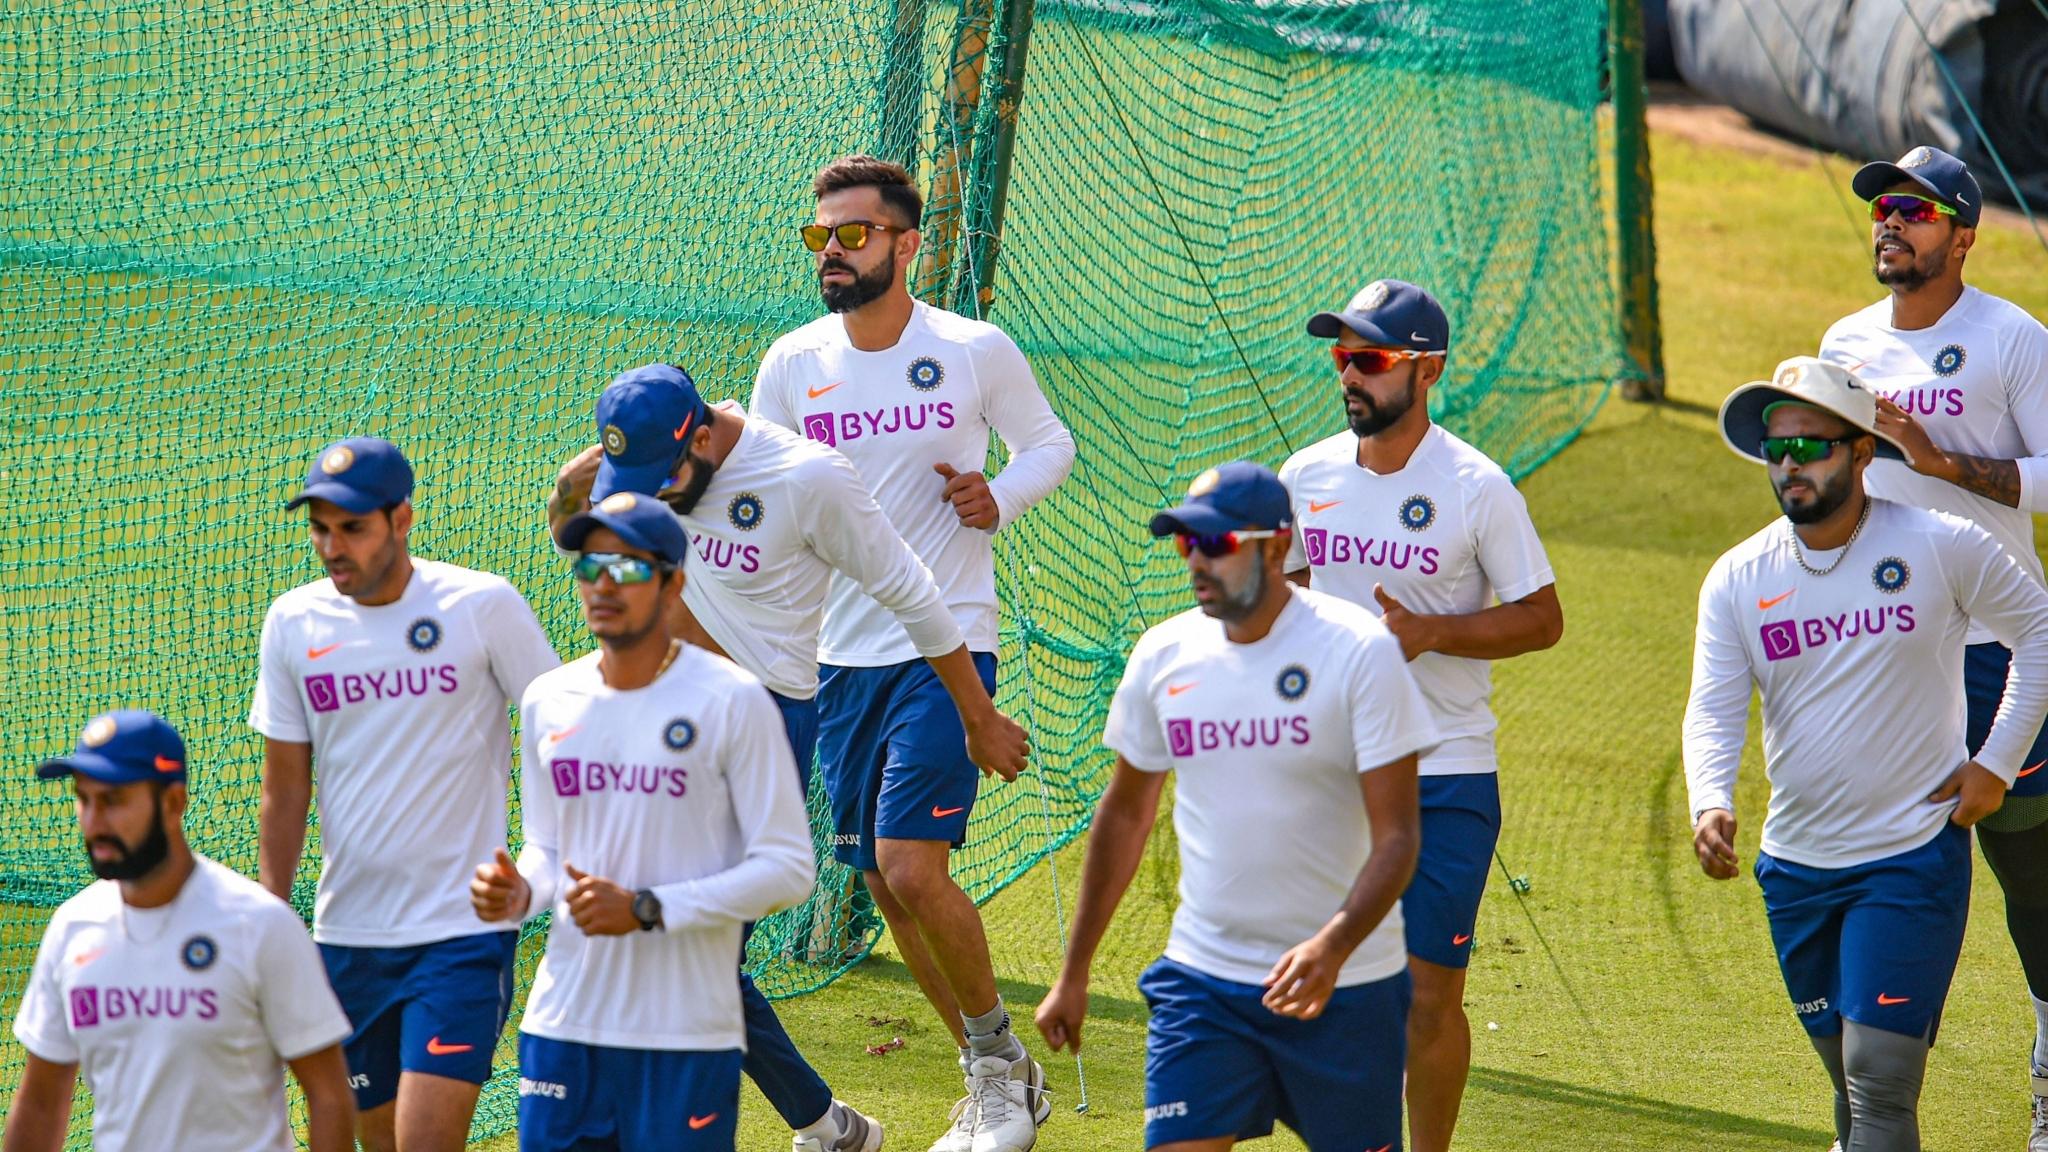 1st Test: India Favourites to Make Short Work of Depleted B'desh